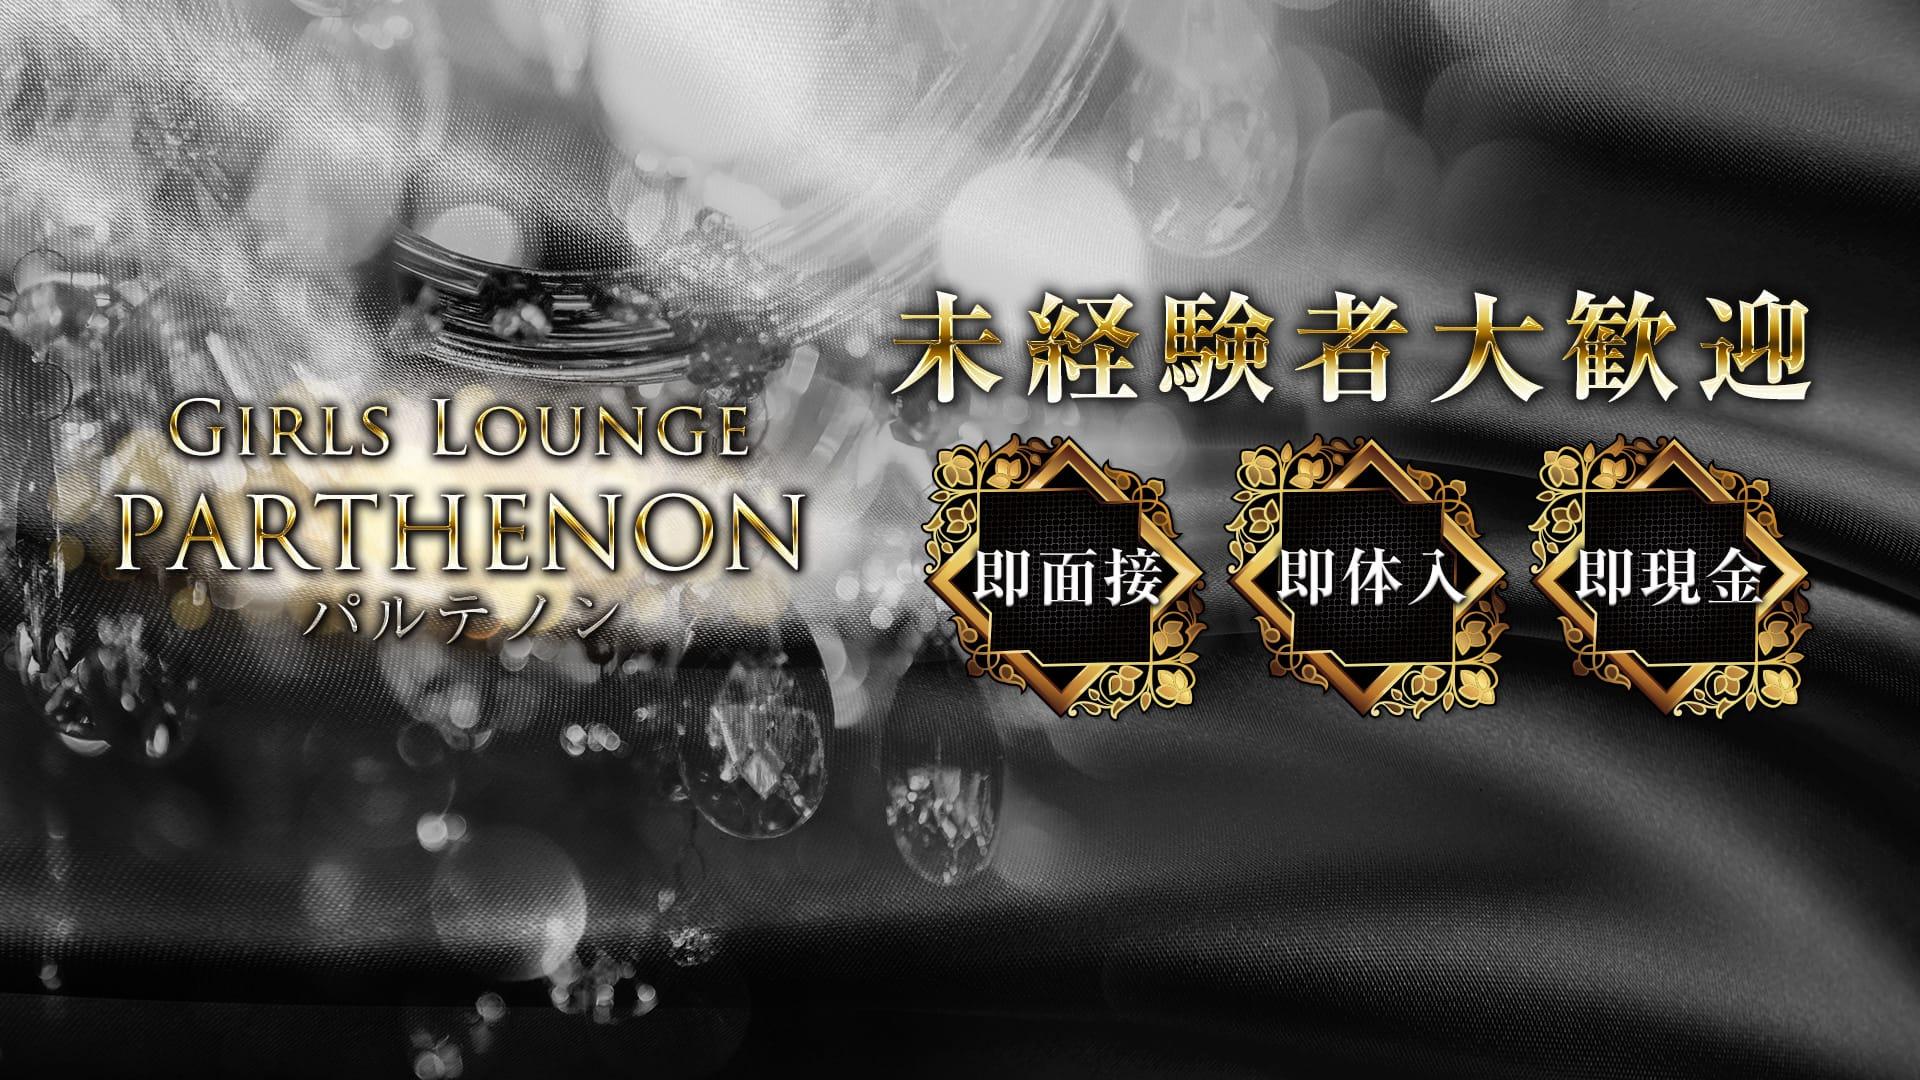 Girls Lounge Parthenon(パルテノン) 南越谷ガールズバー TOP画像